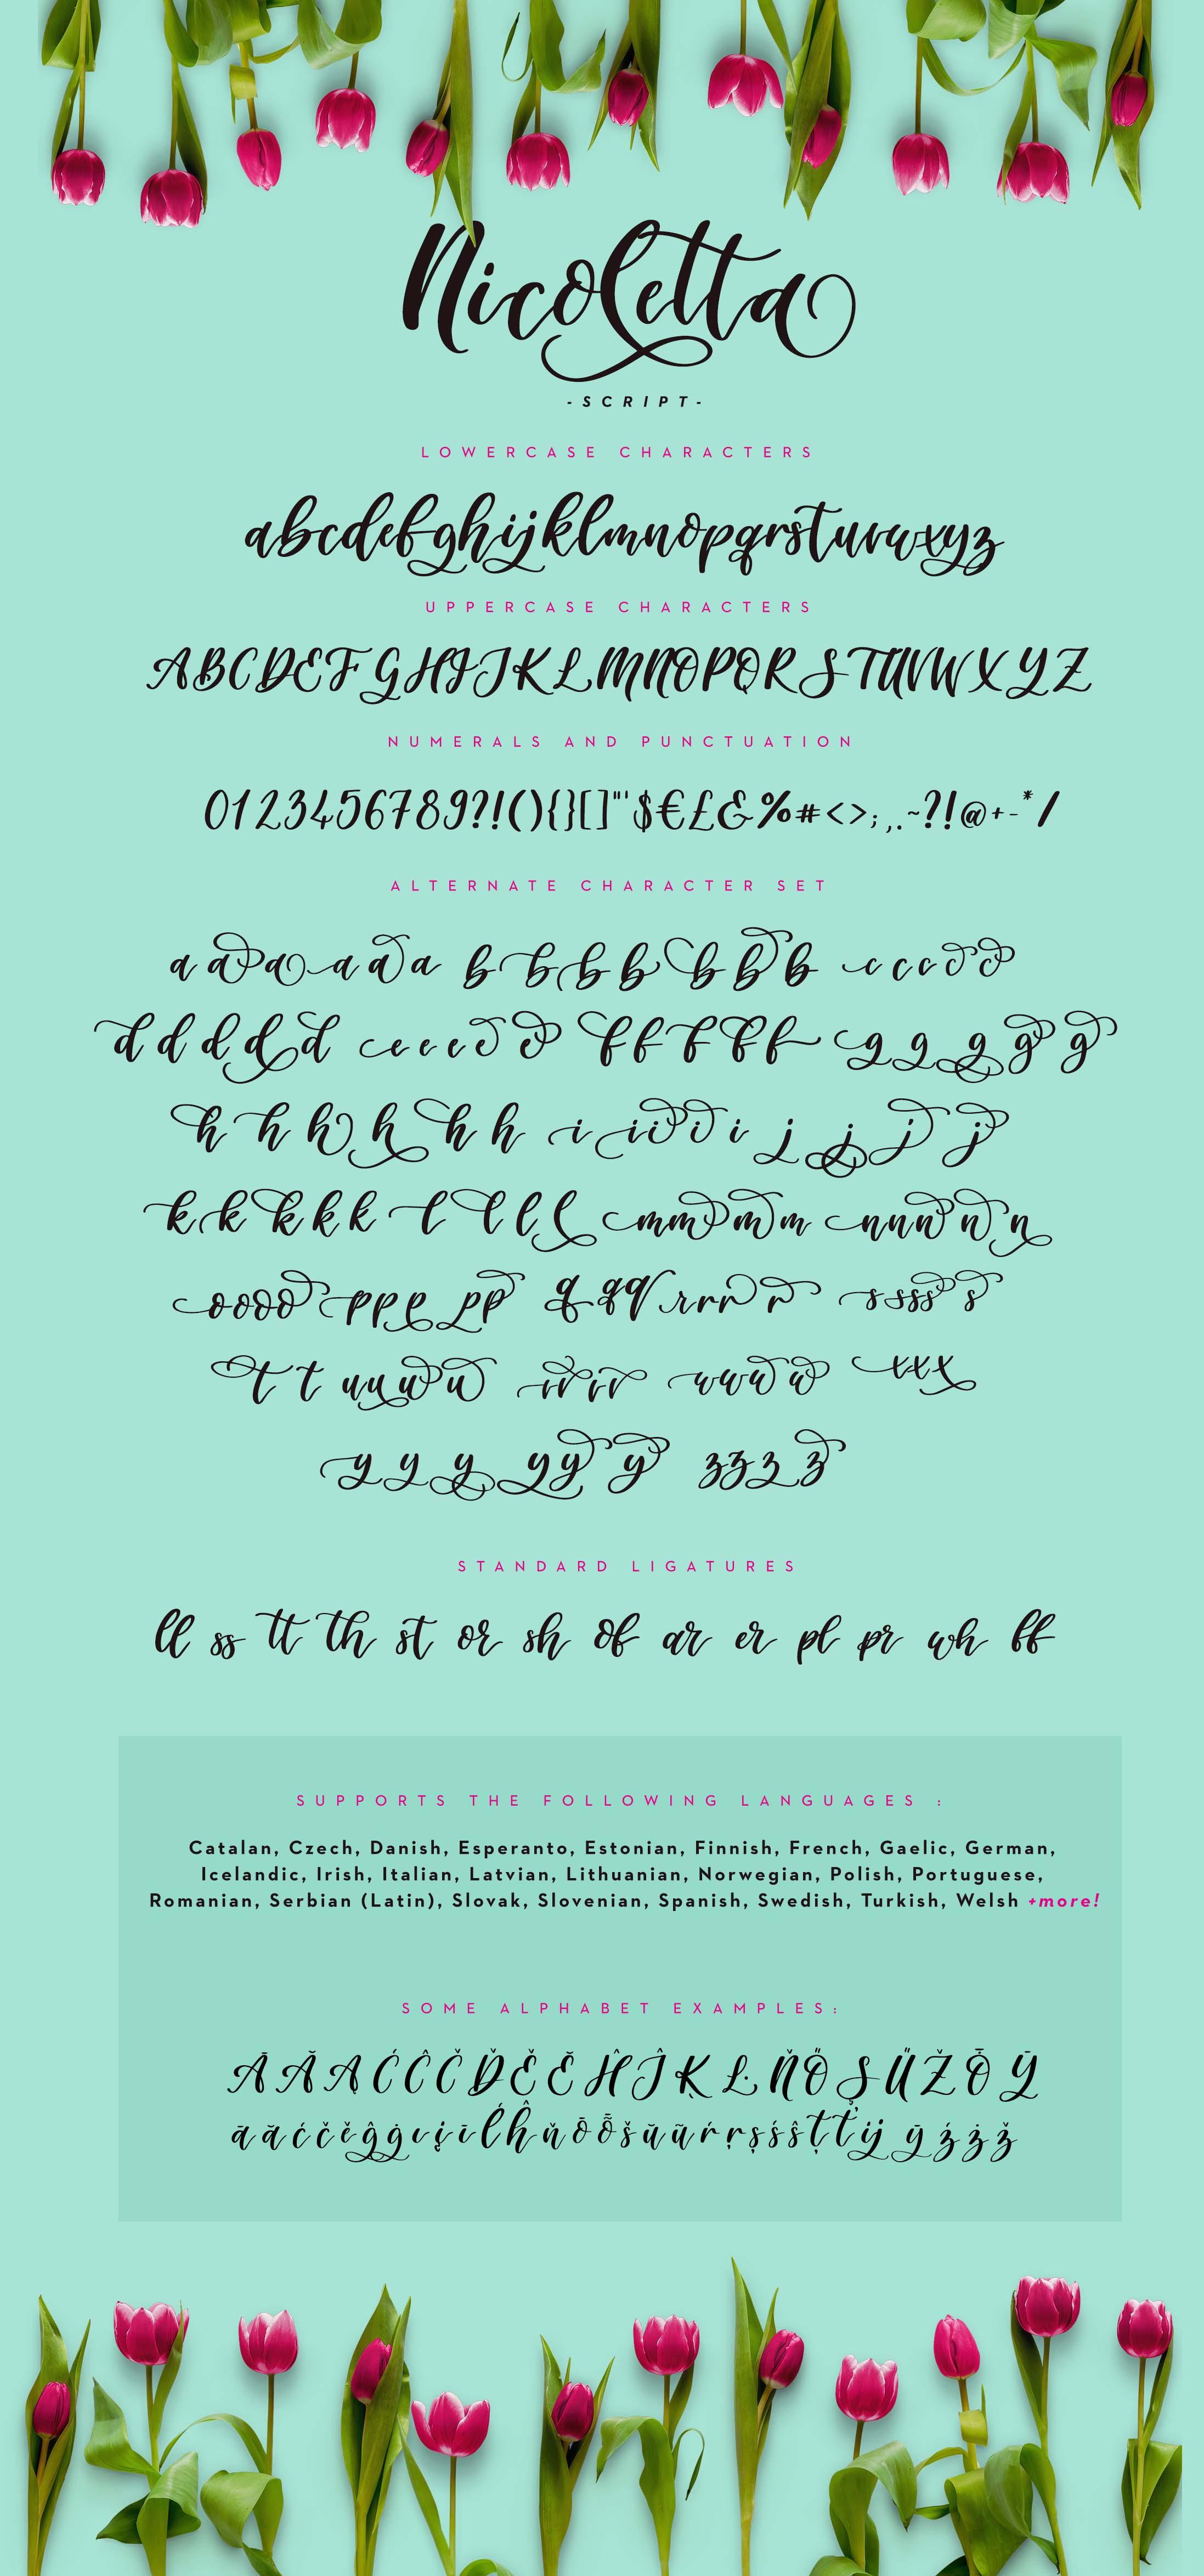 Nicoletta Script - A Handwritten, Multilingual Script Font example image 2